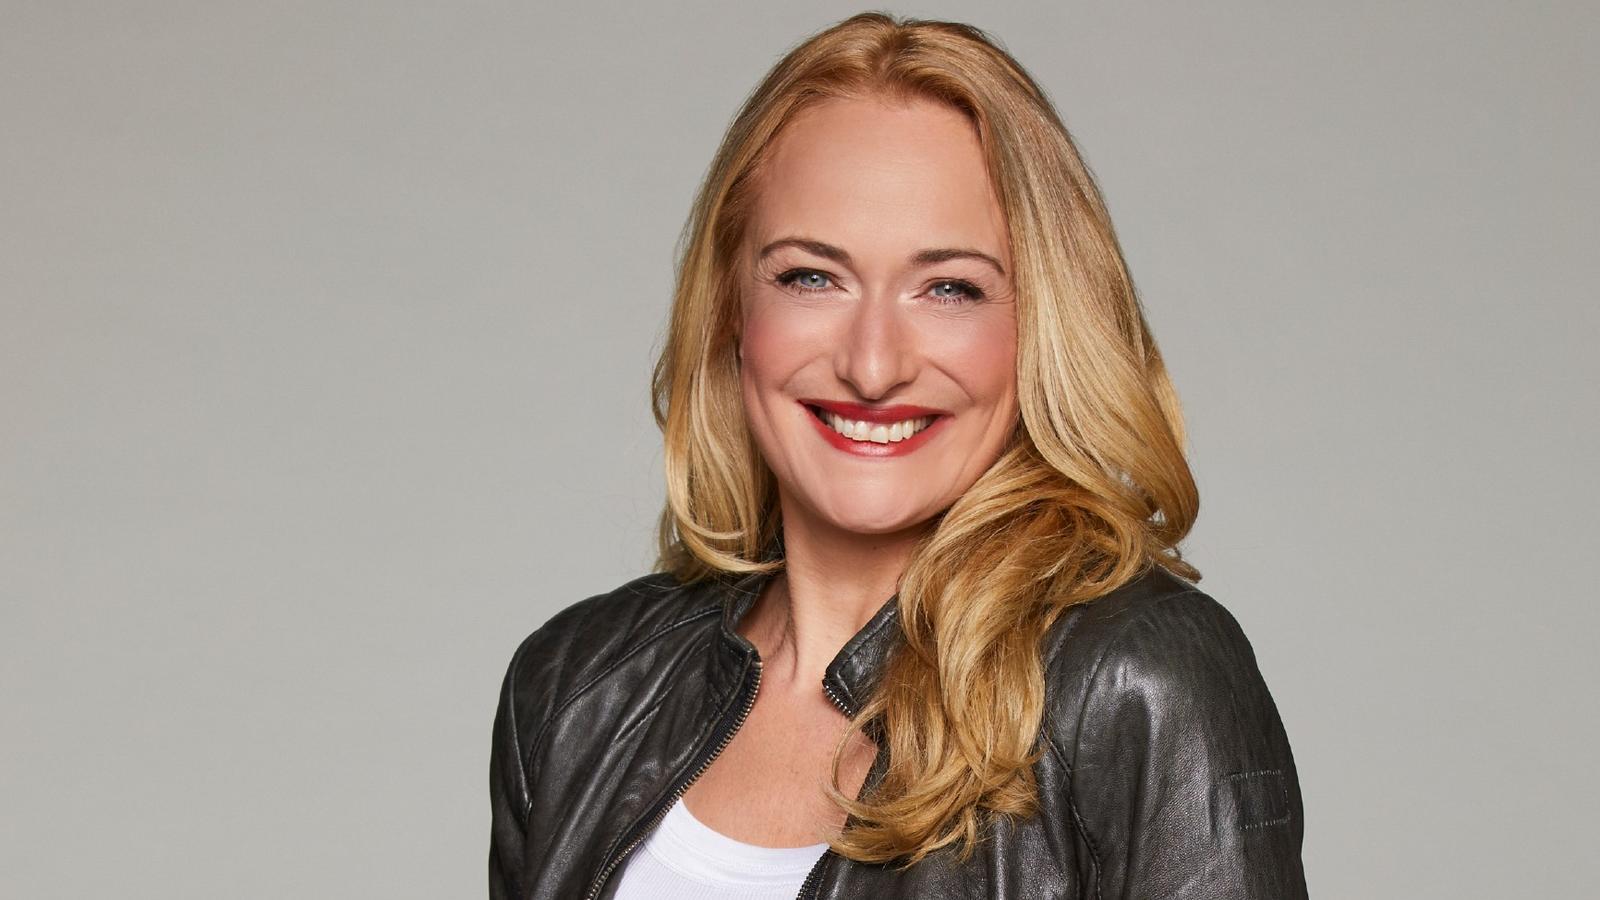 GZSZ: Untenrum nackt? Eva Mona Rodekirchen verwirrt die Fans